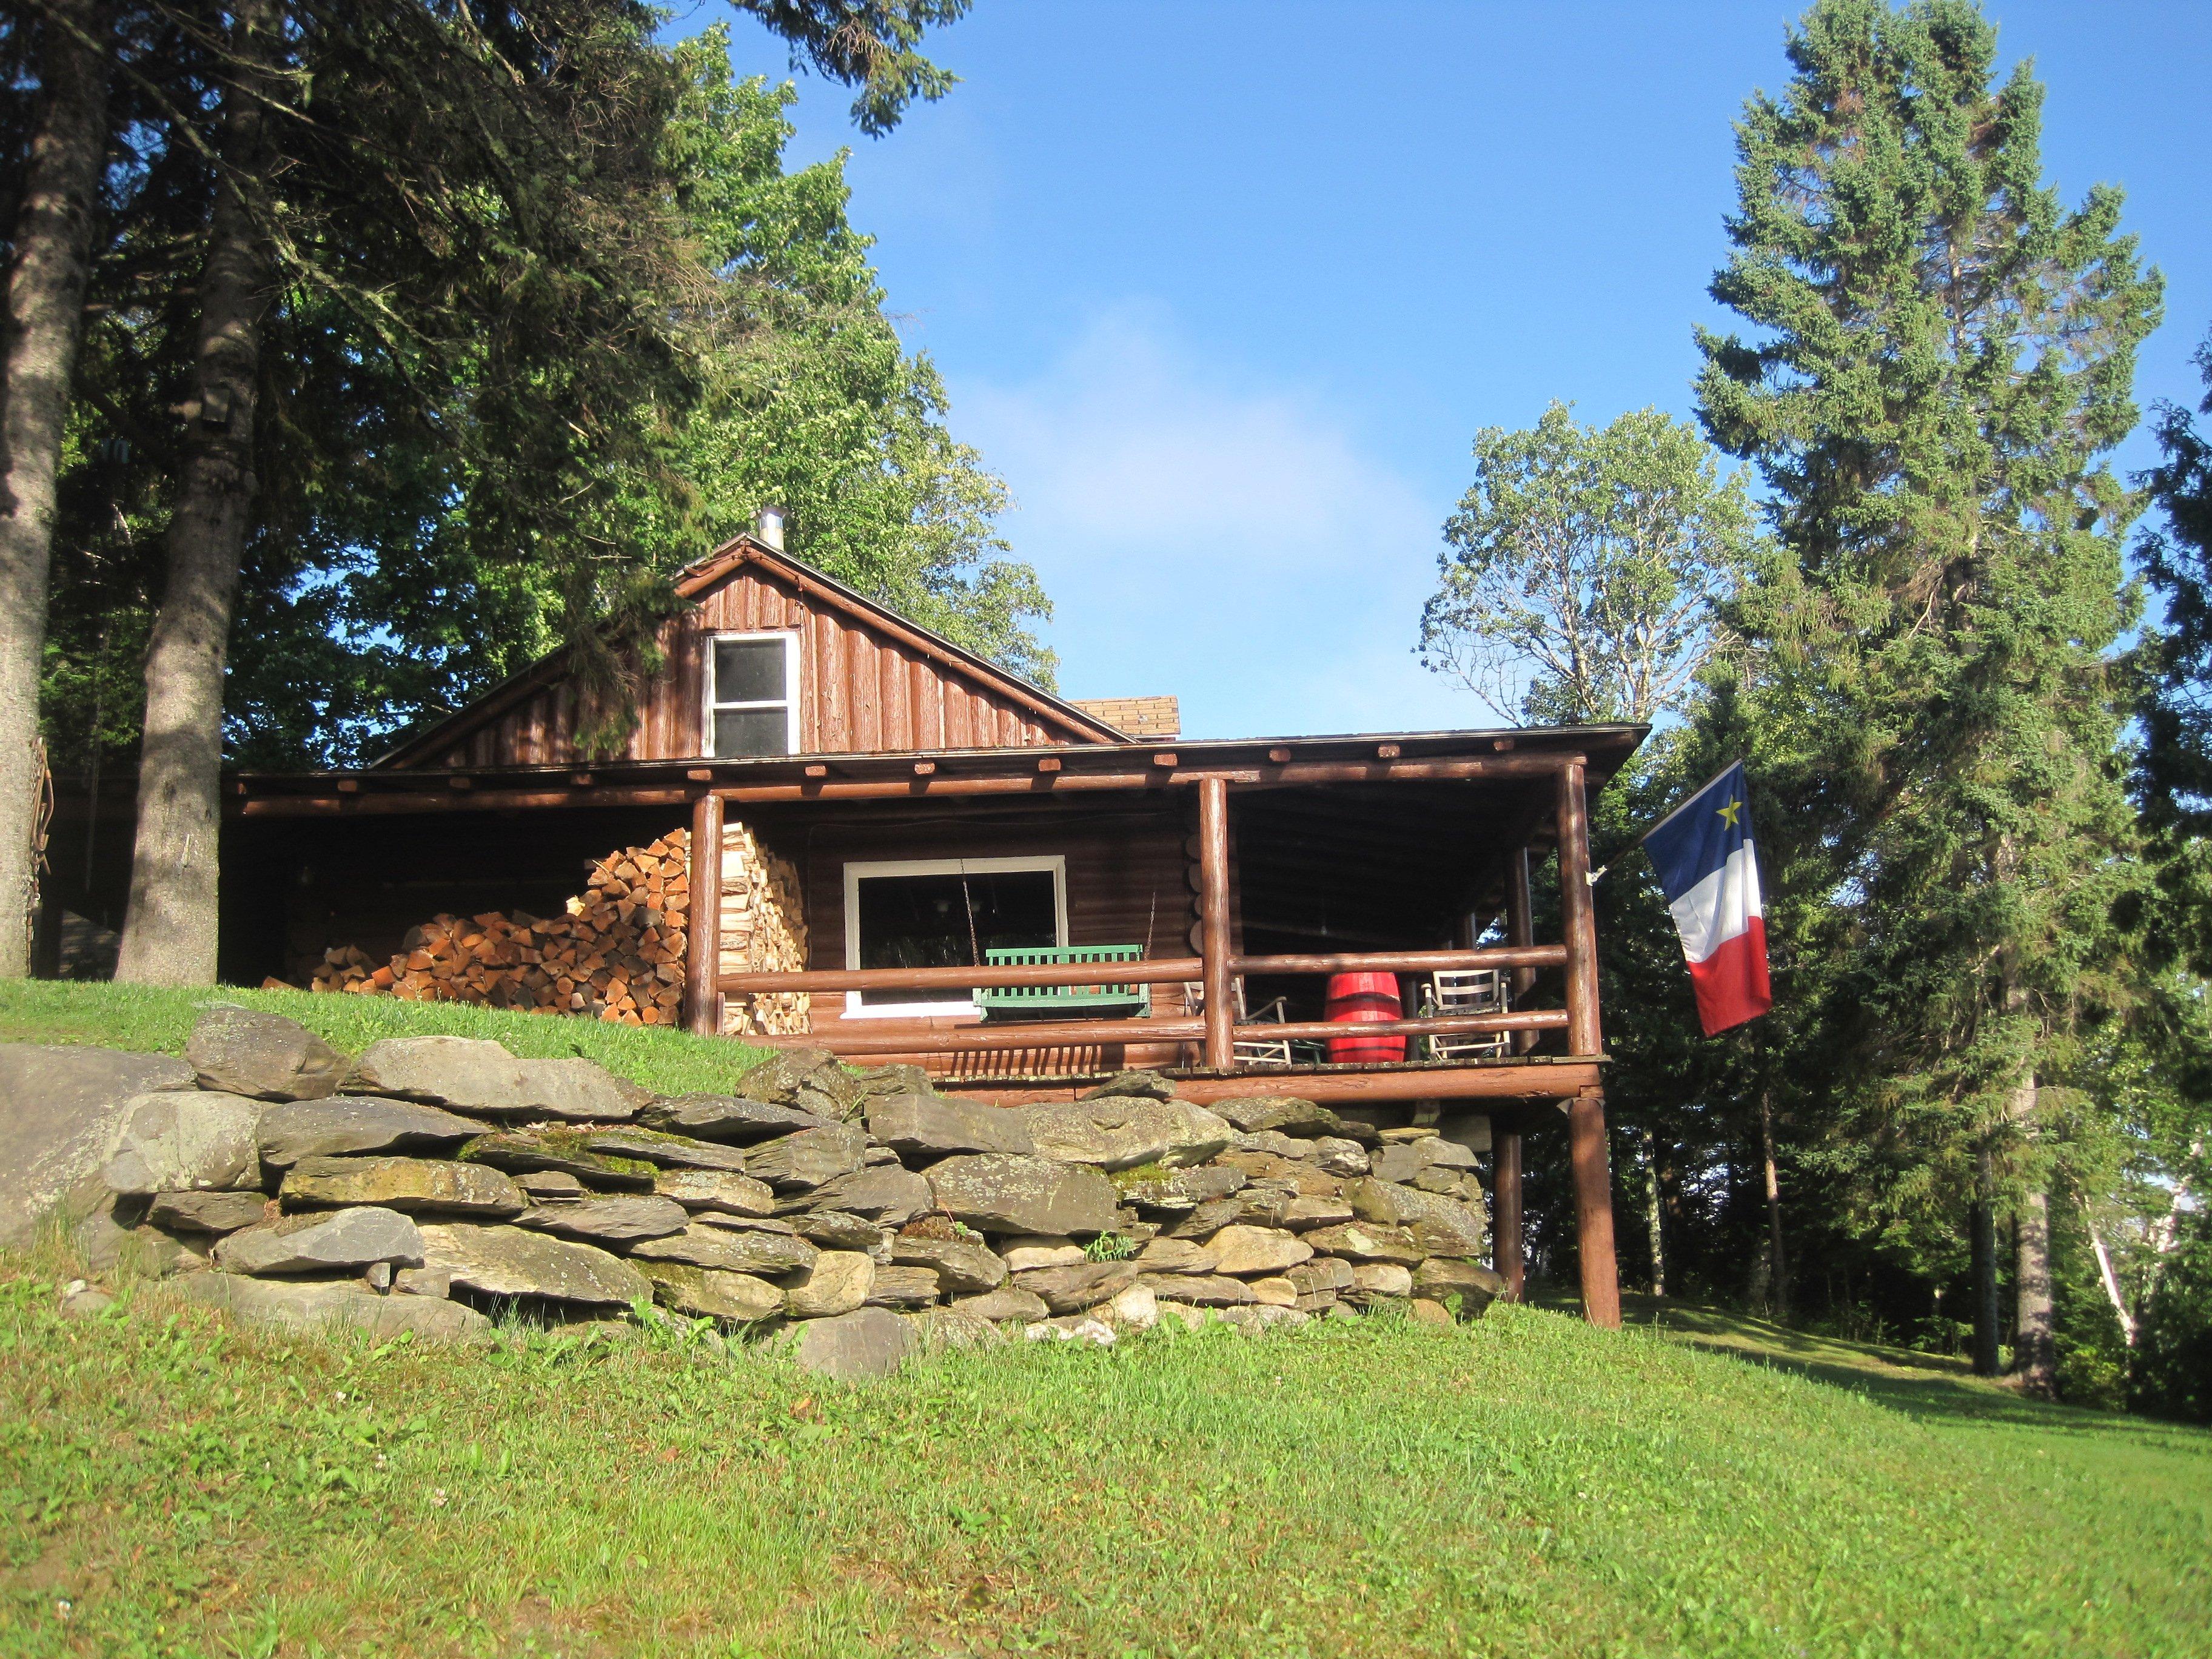 Historic log lodge, circa 1900.